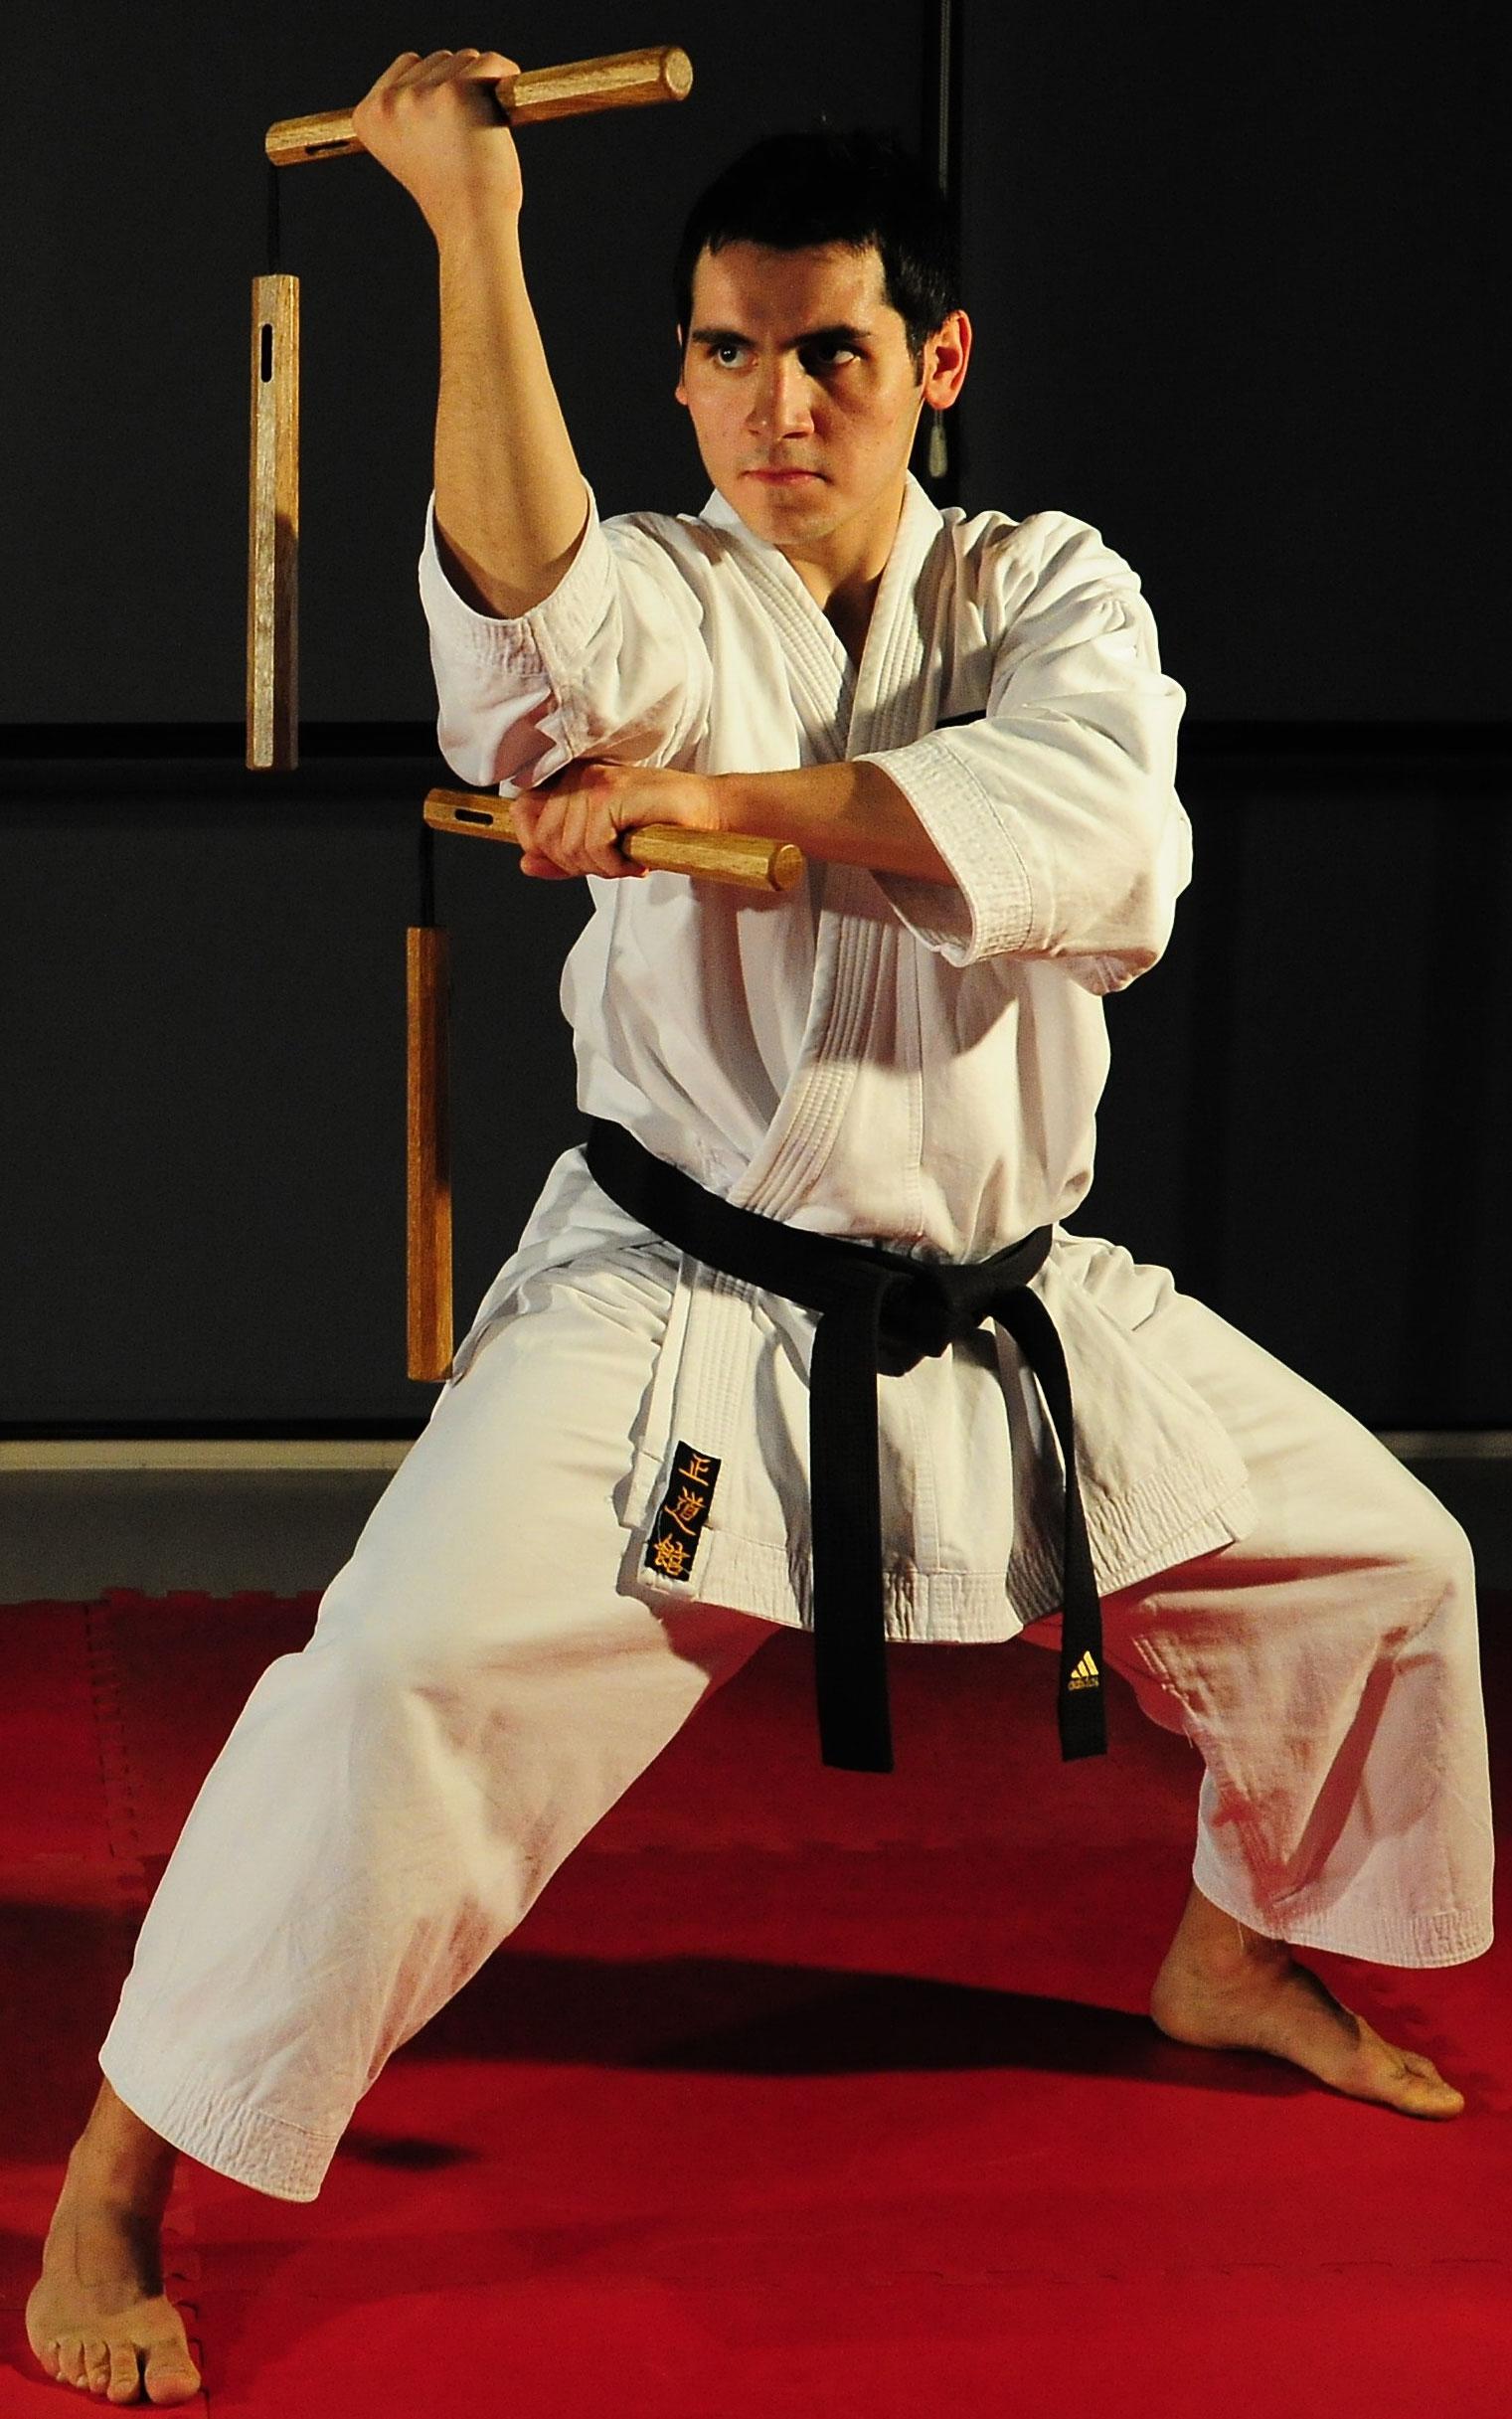 Taekwondo Weapons Training | Taekwondo Wiki | FANDOM powered by Wikia